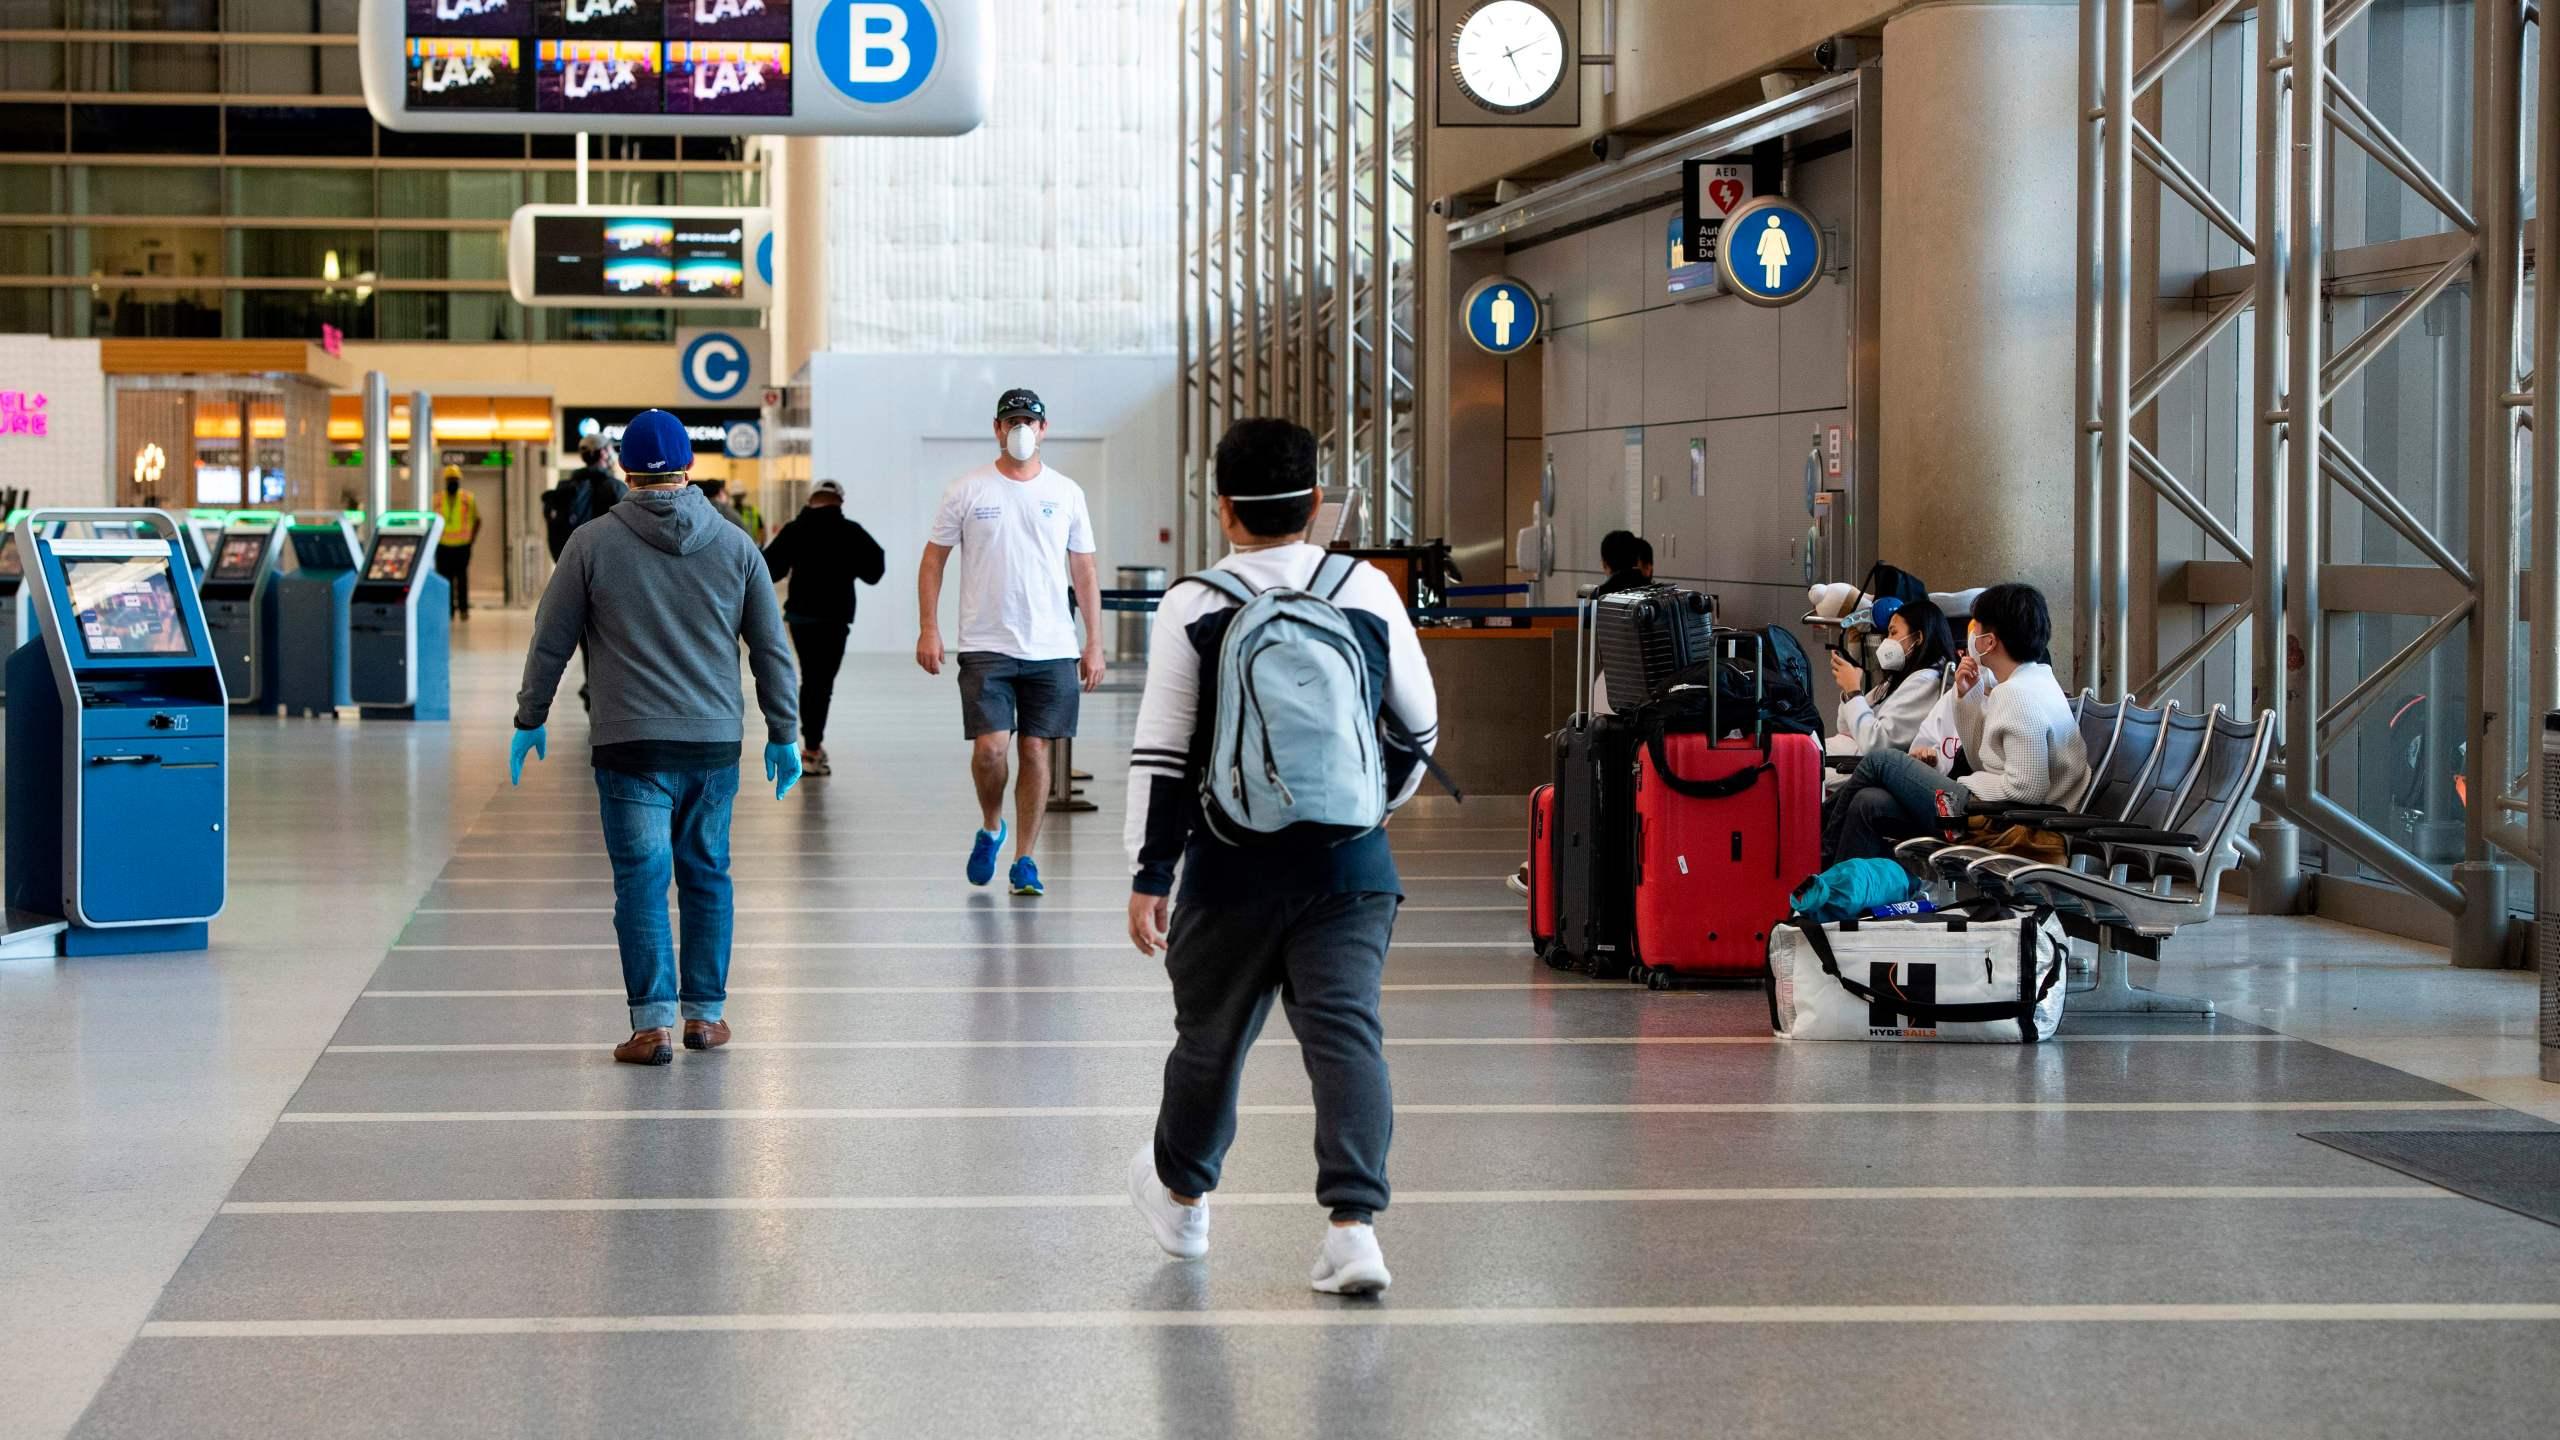 People wearing masks walk inside Tom Bradley Terminal at Los Angeles International Airport on April 16, 2020. (VALERIE MACON/AFP via Getty Images)